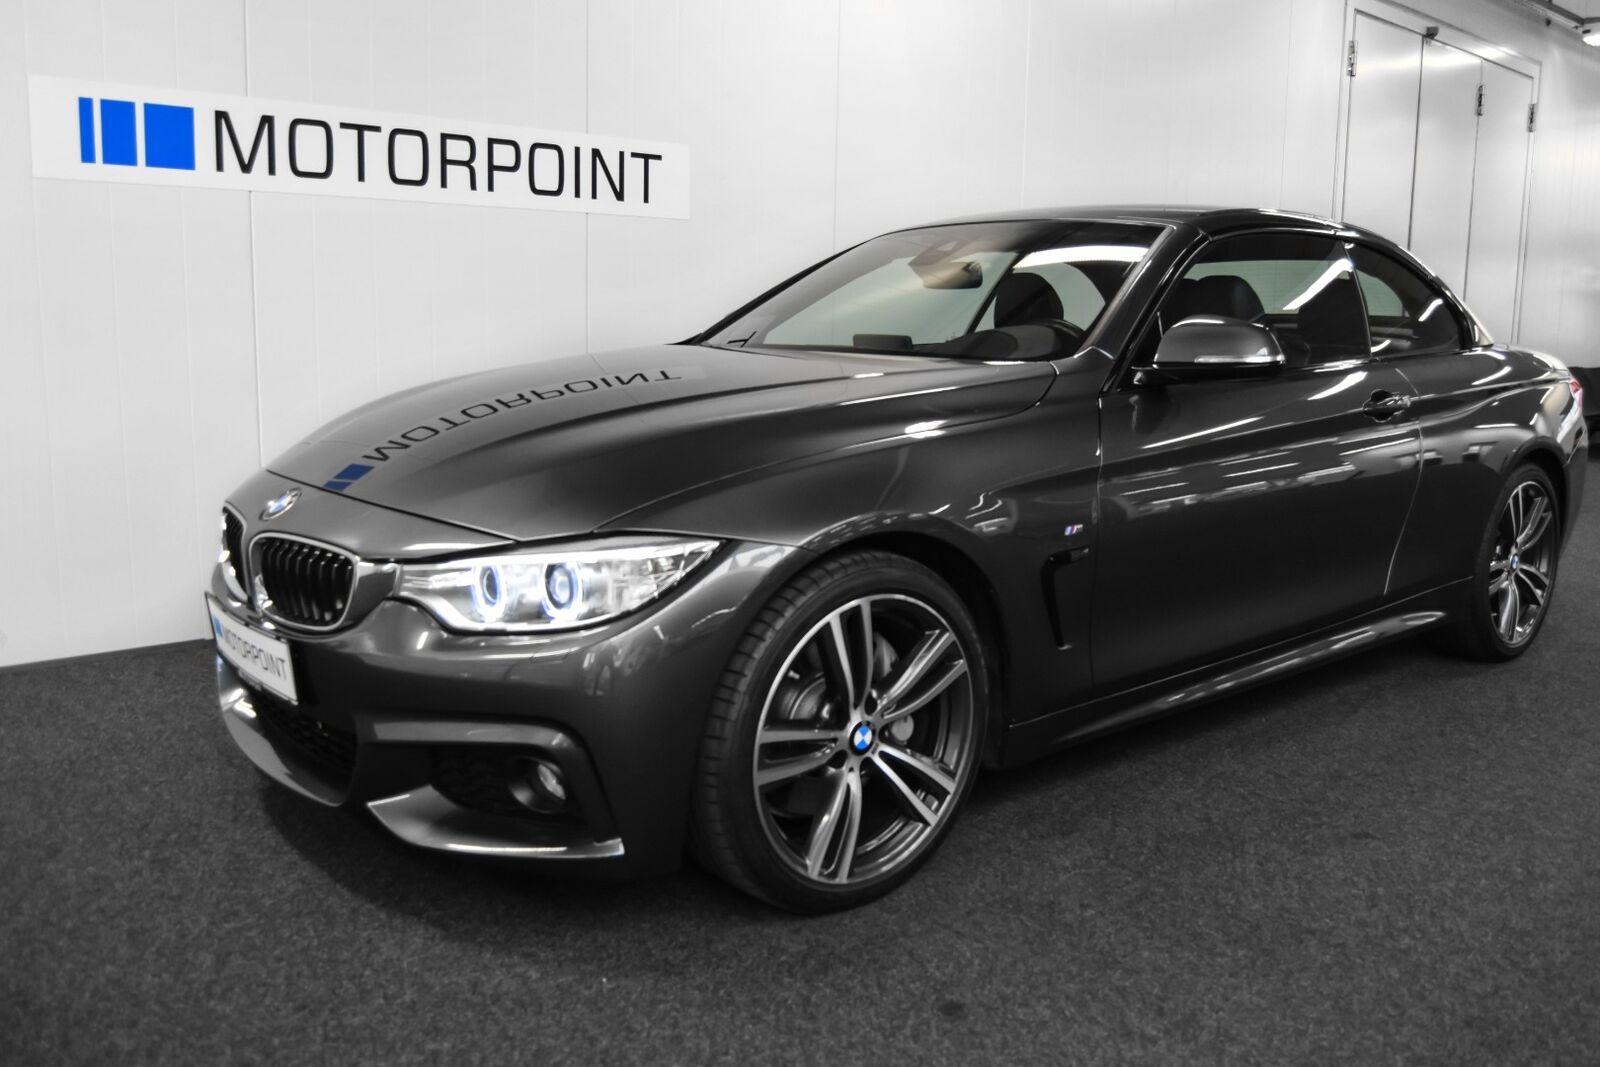 BMW 435i 3,0 Cabriolet aut. 2d - 3.420 kr.